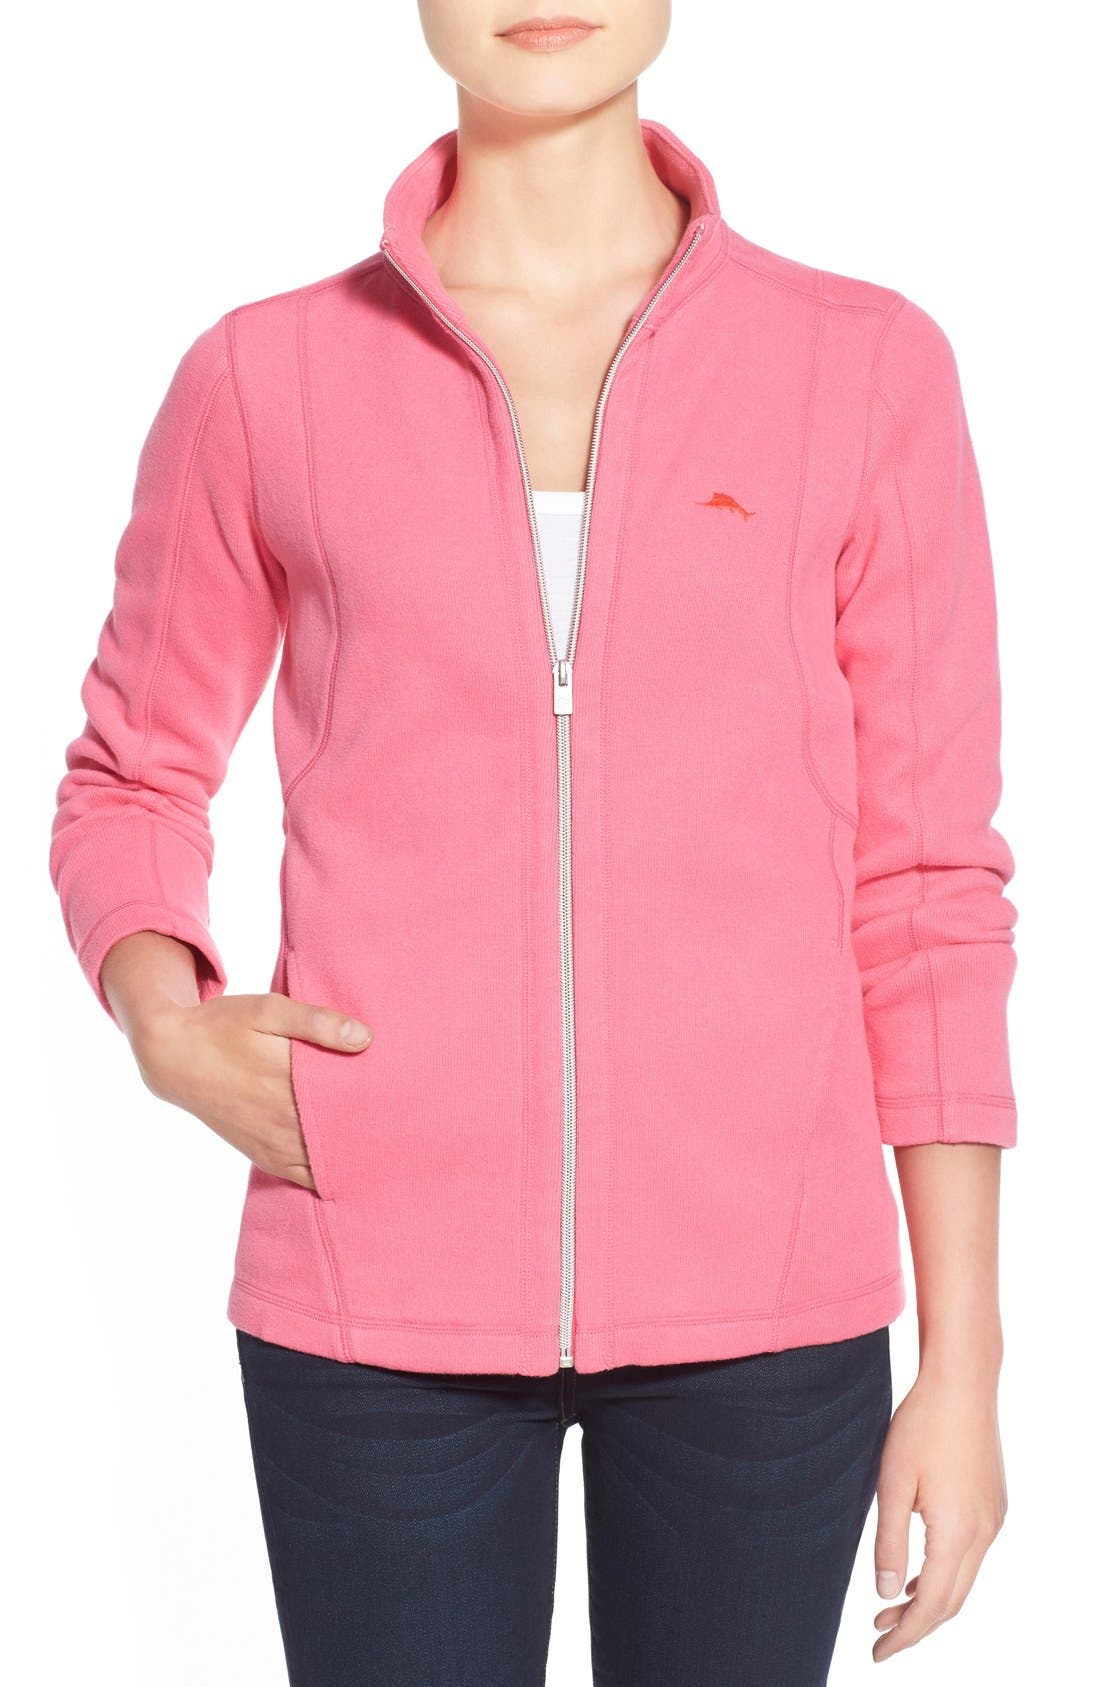 'Aruba' Full Zip Sweatshirt,                             Main thumbnail 6, color,